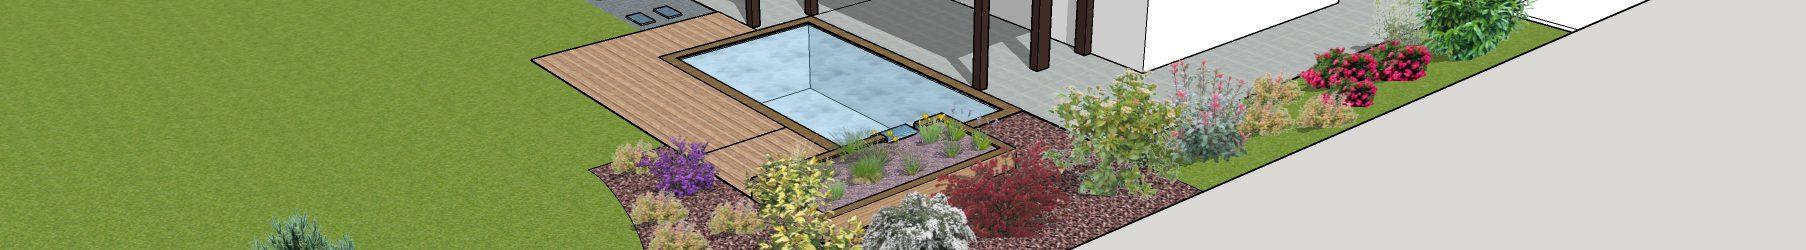 Projet de petite baignade naturelle en Alsace